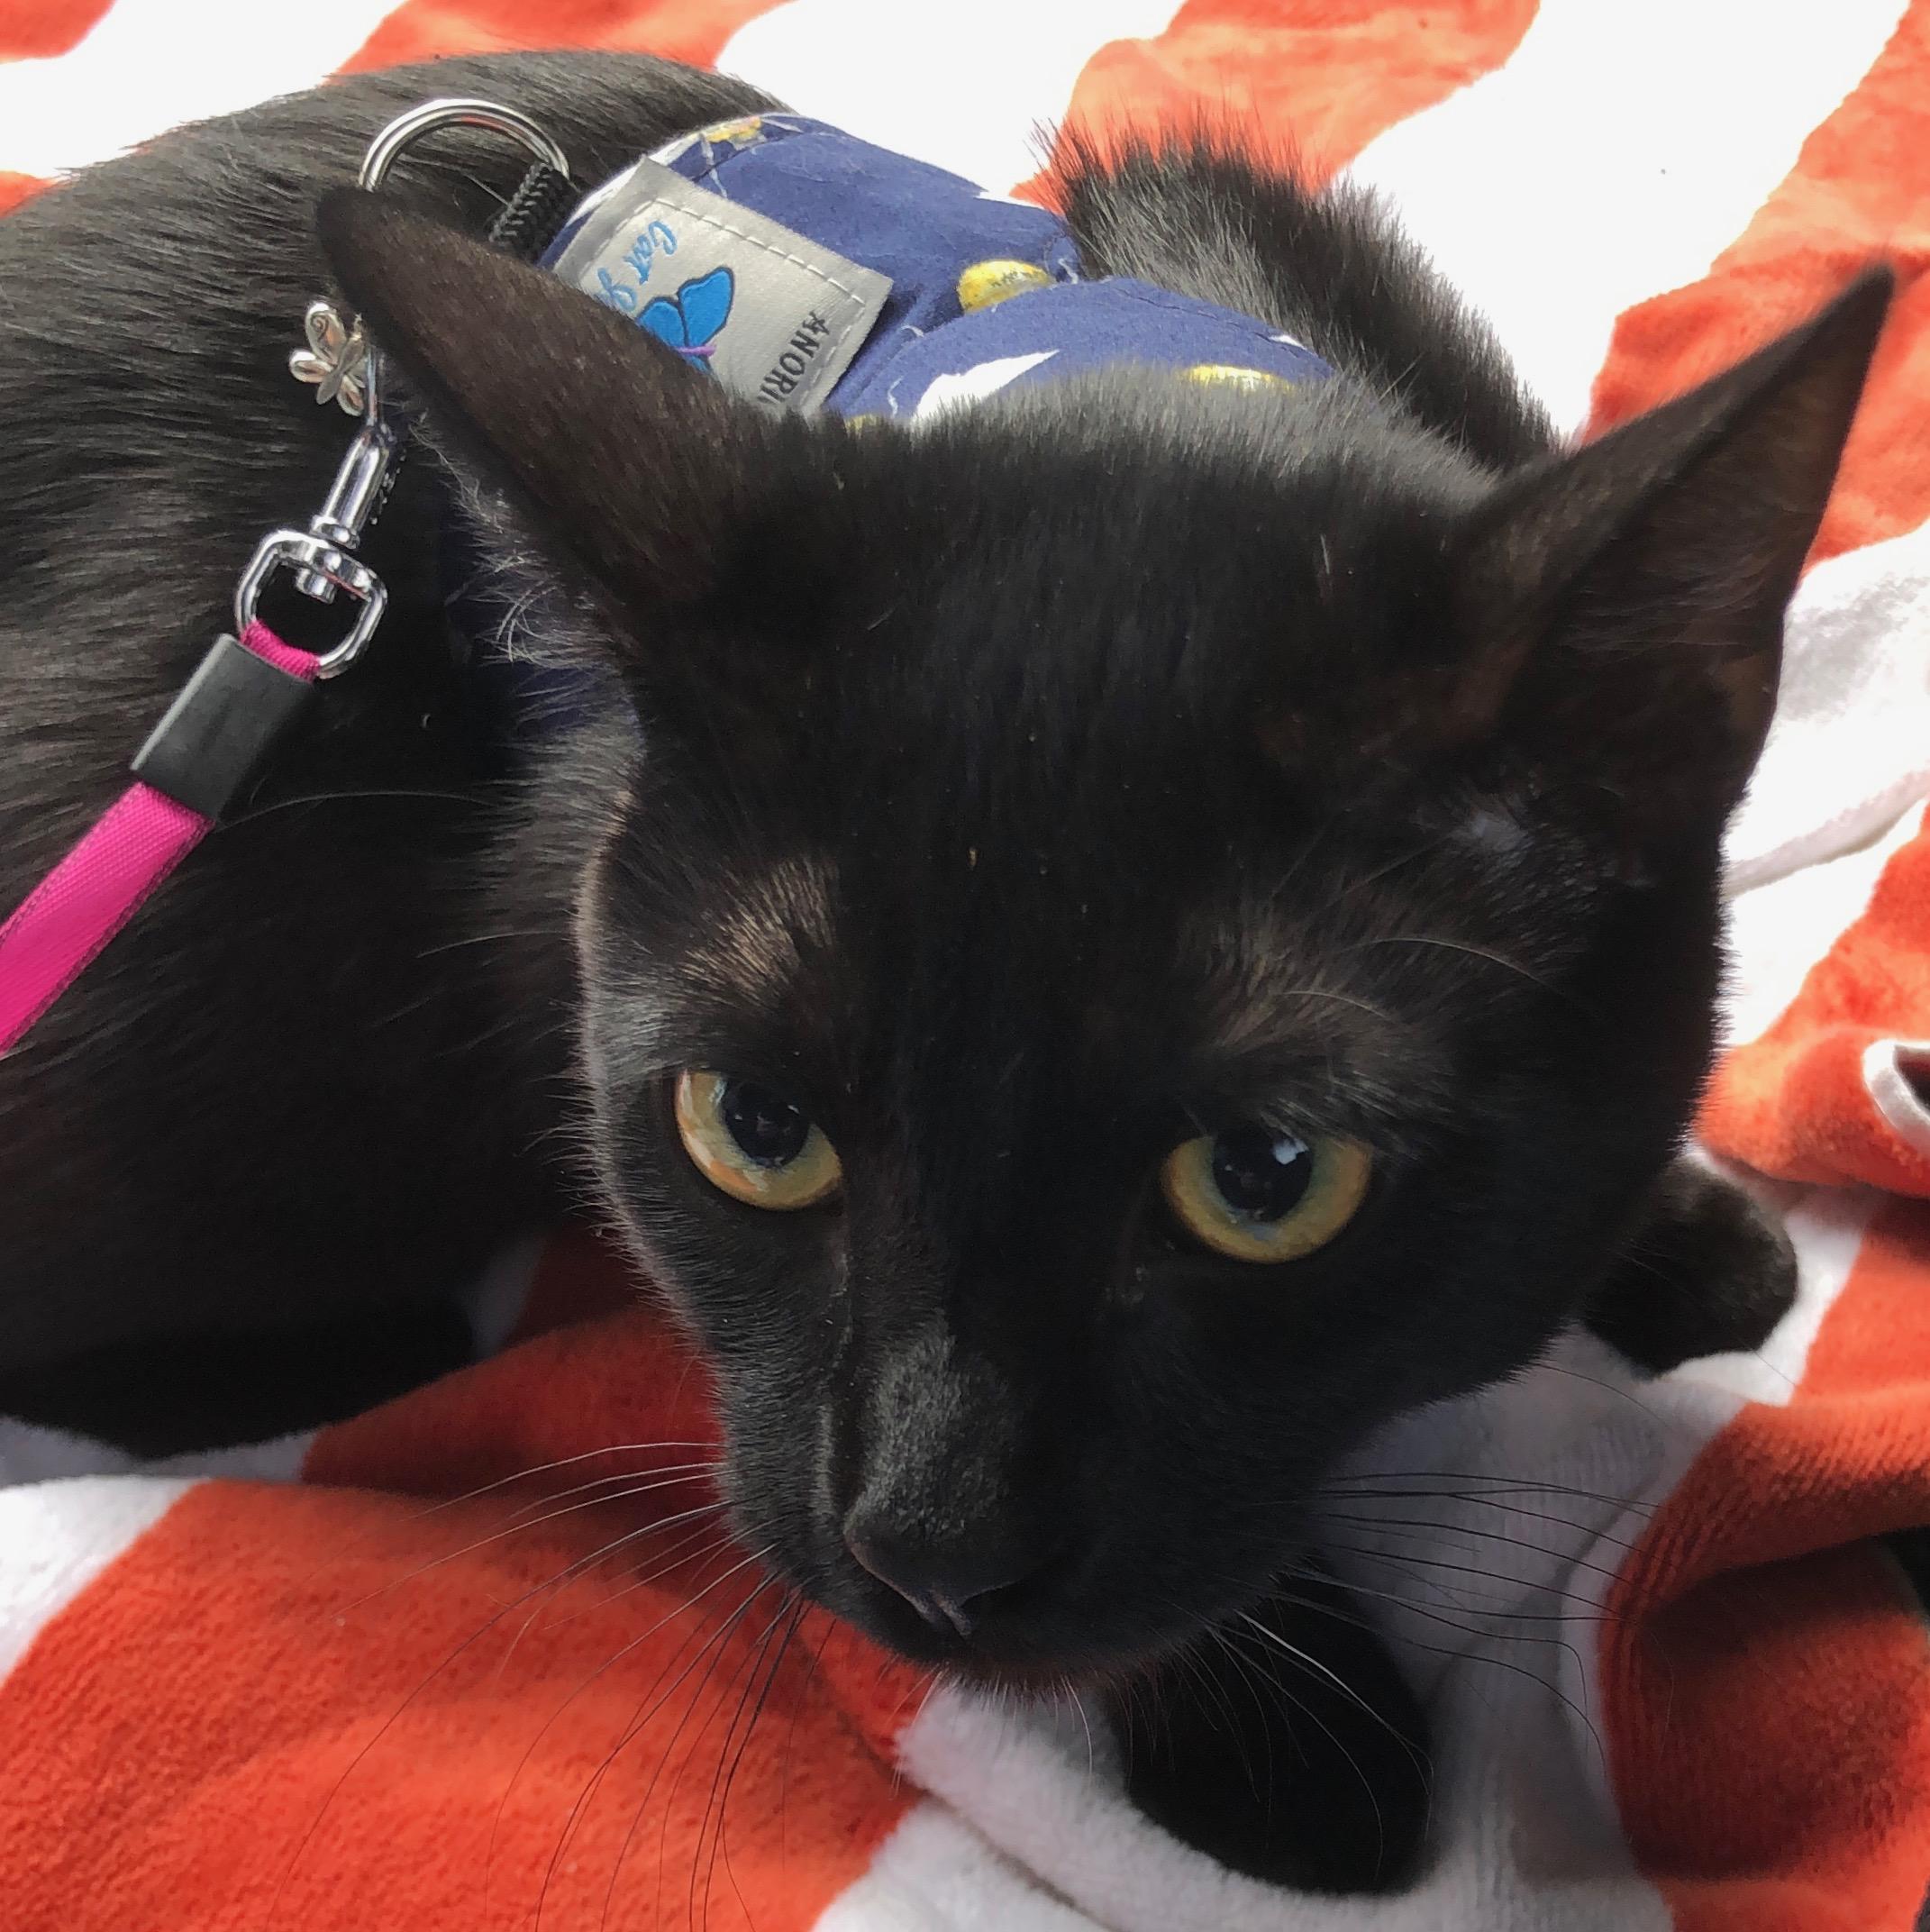 Black Cat Looking Curious